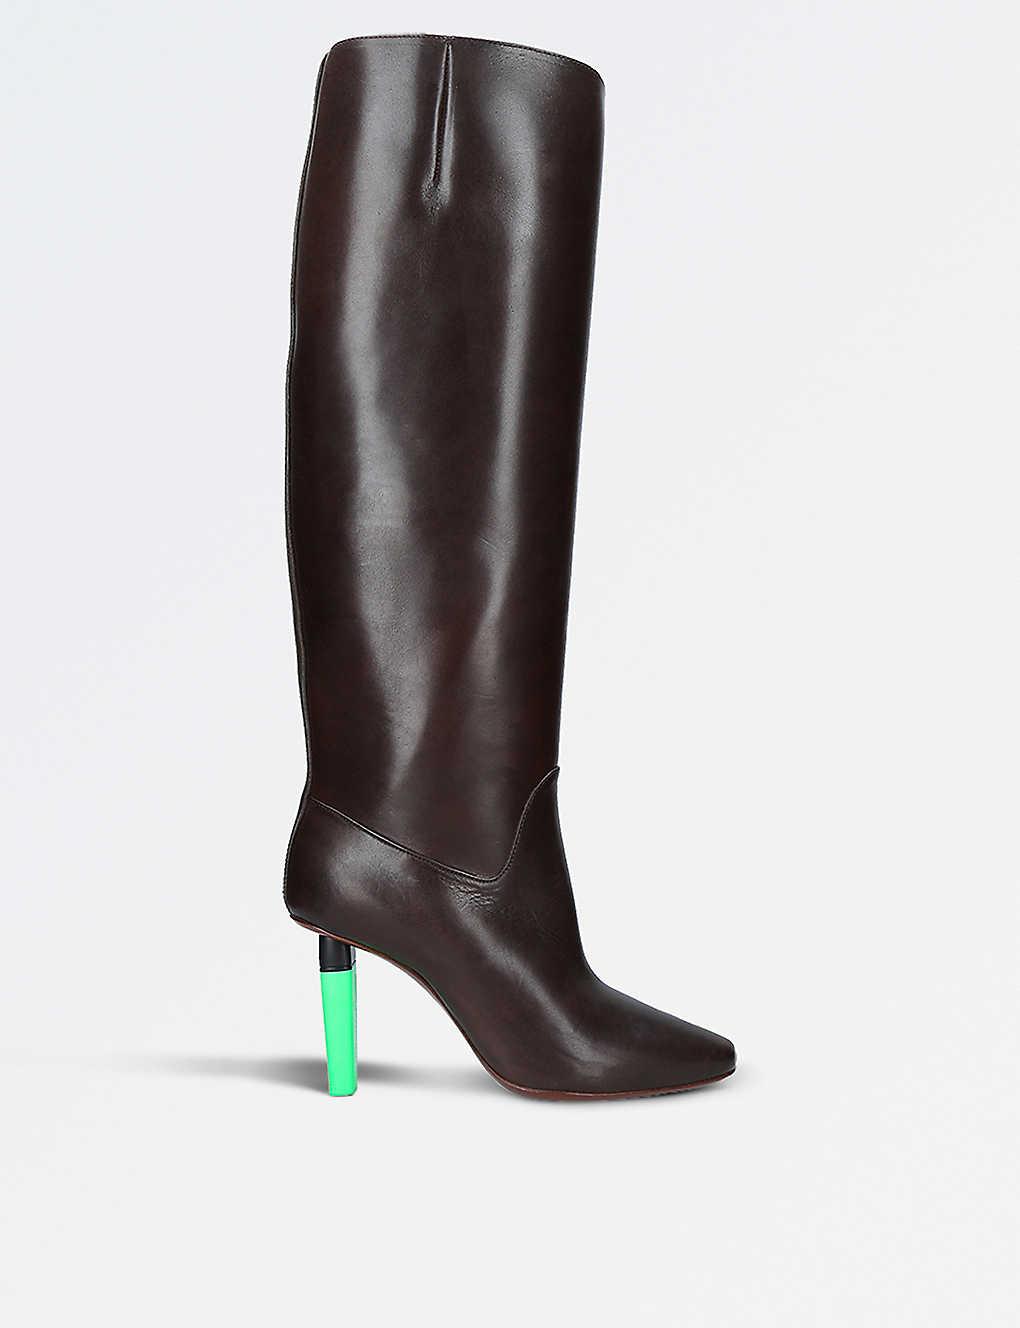 VetementsHighlighter Social Worker Boots